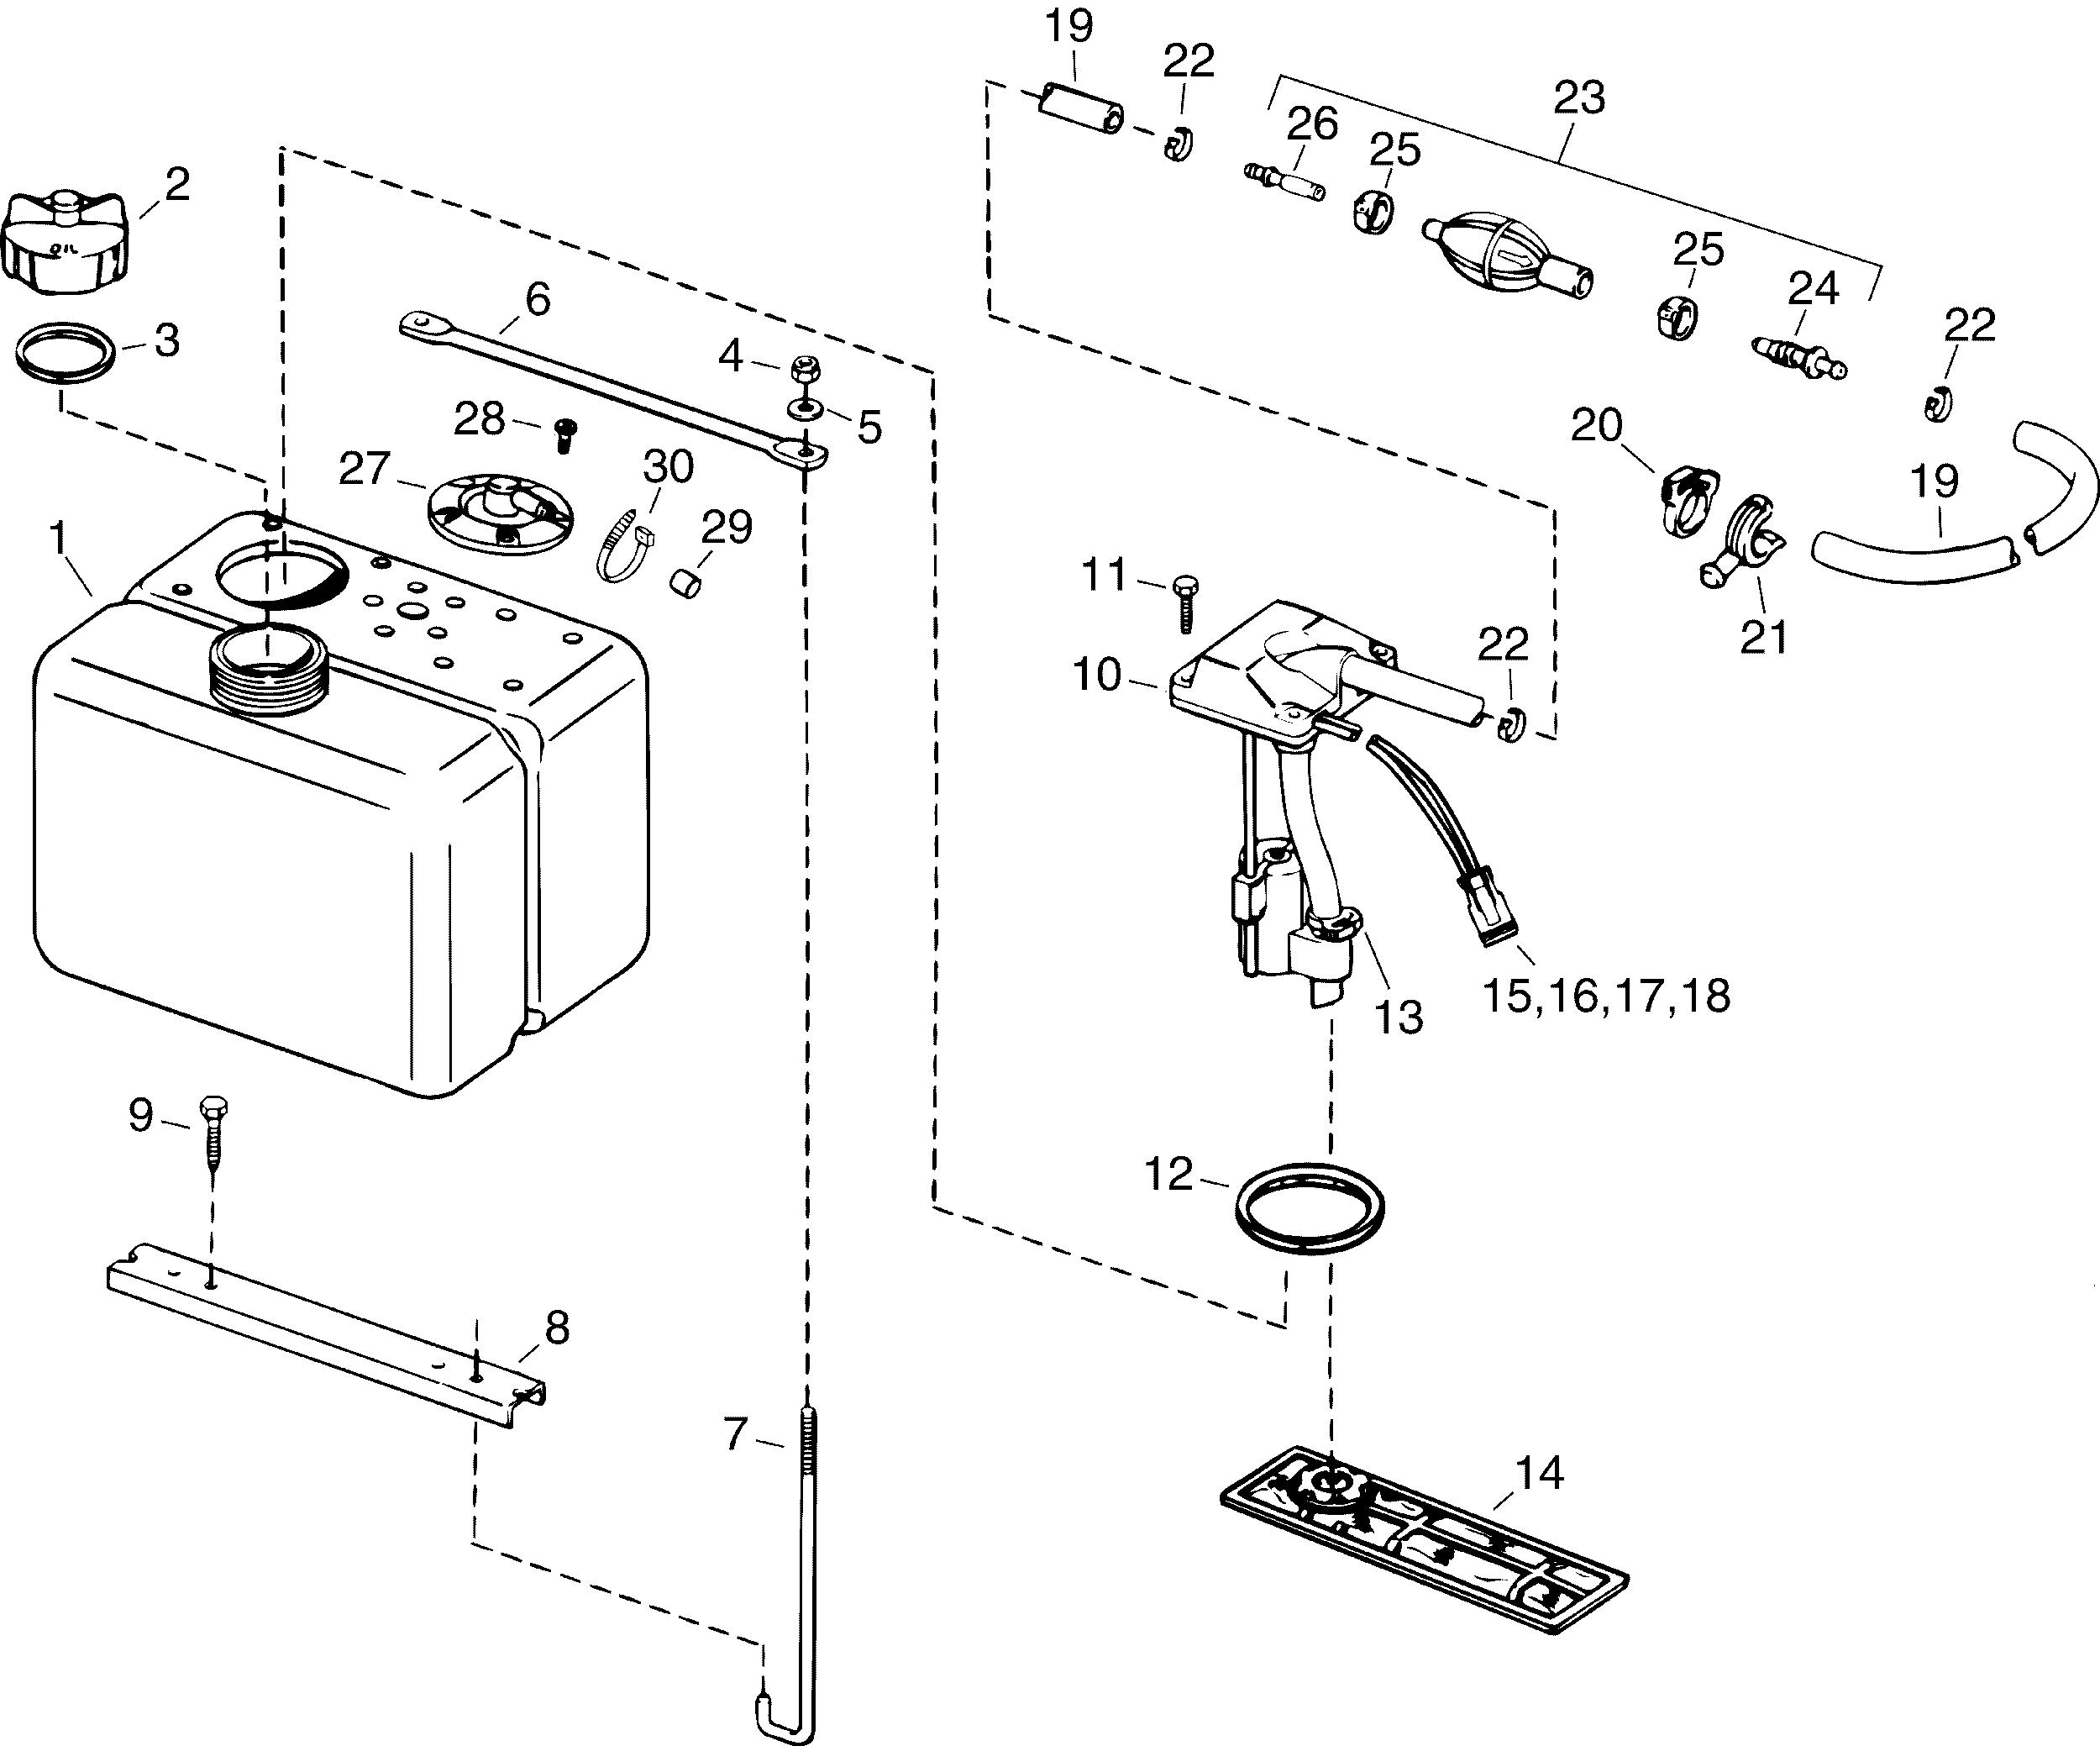 Zx7r Fuel Filter